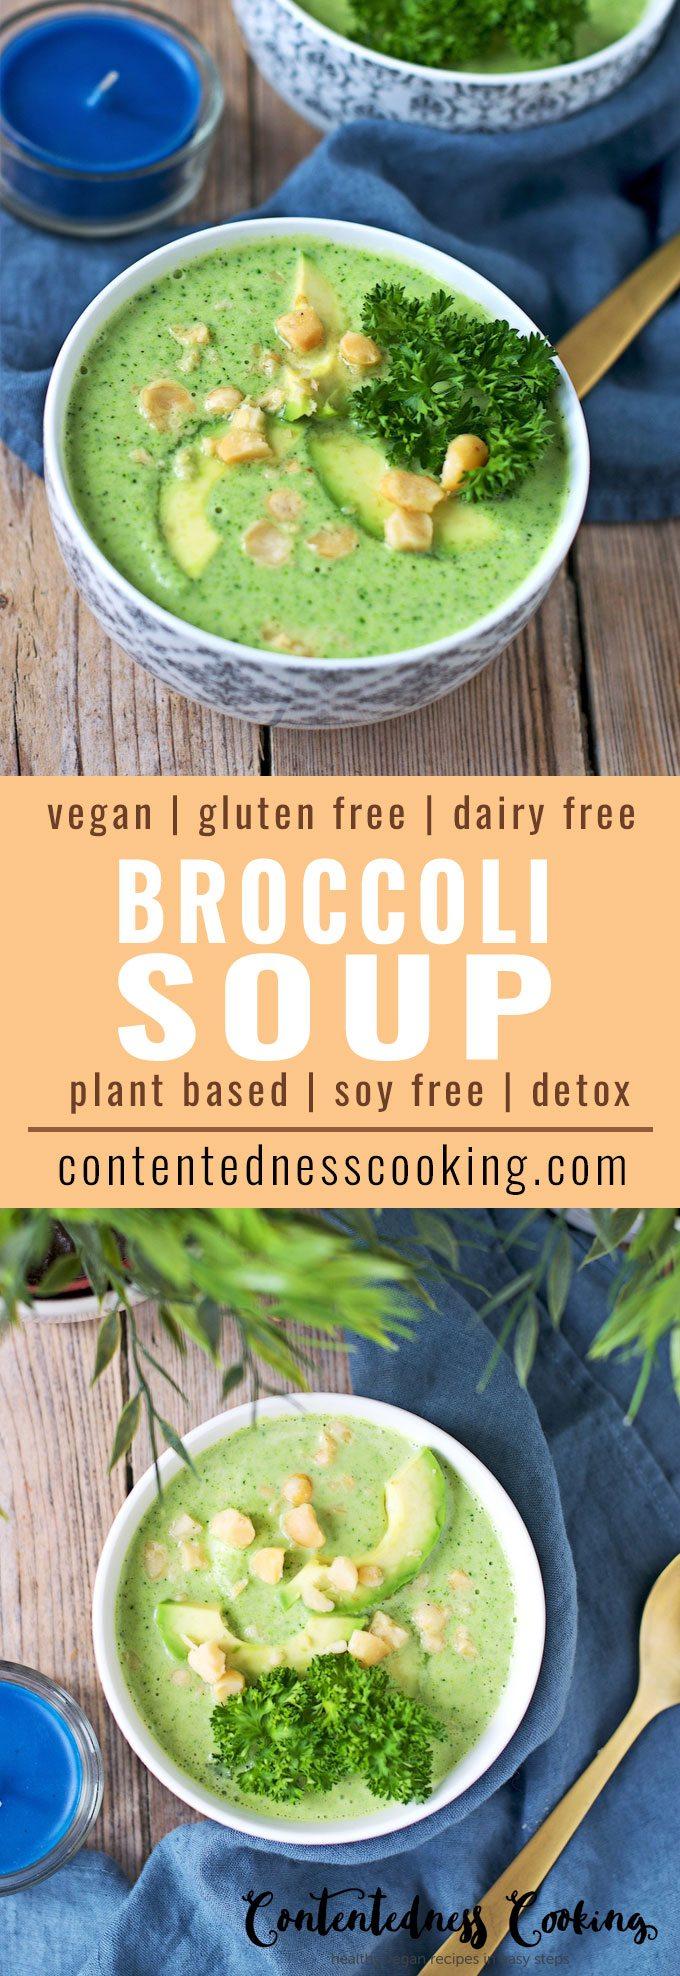 Detox Broccoli Soup | #vegan #glutenfree #contentednesscooking #detox #plantbased